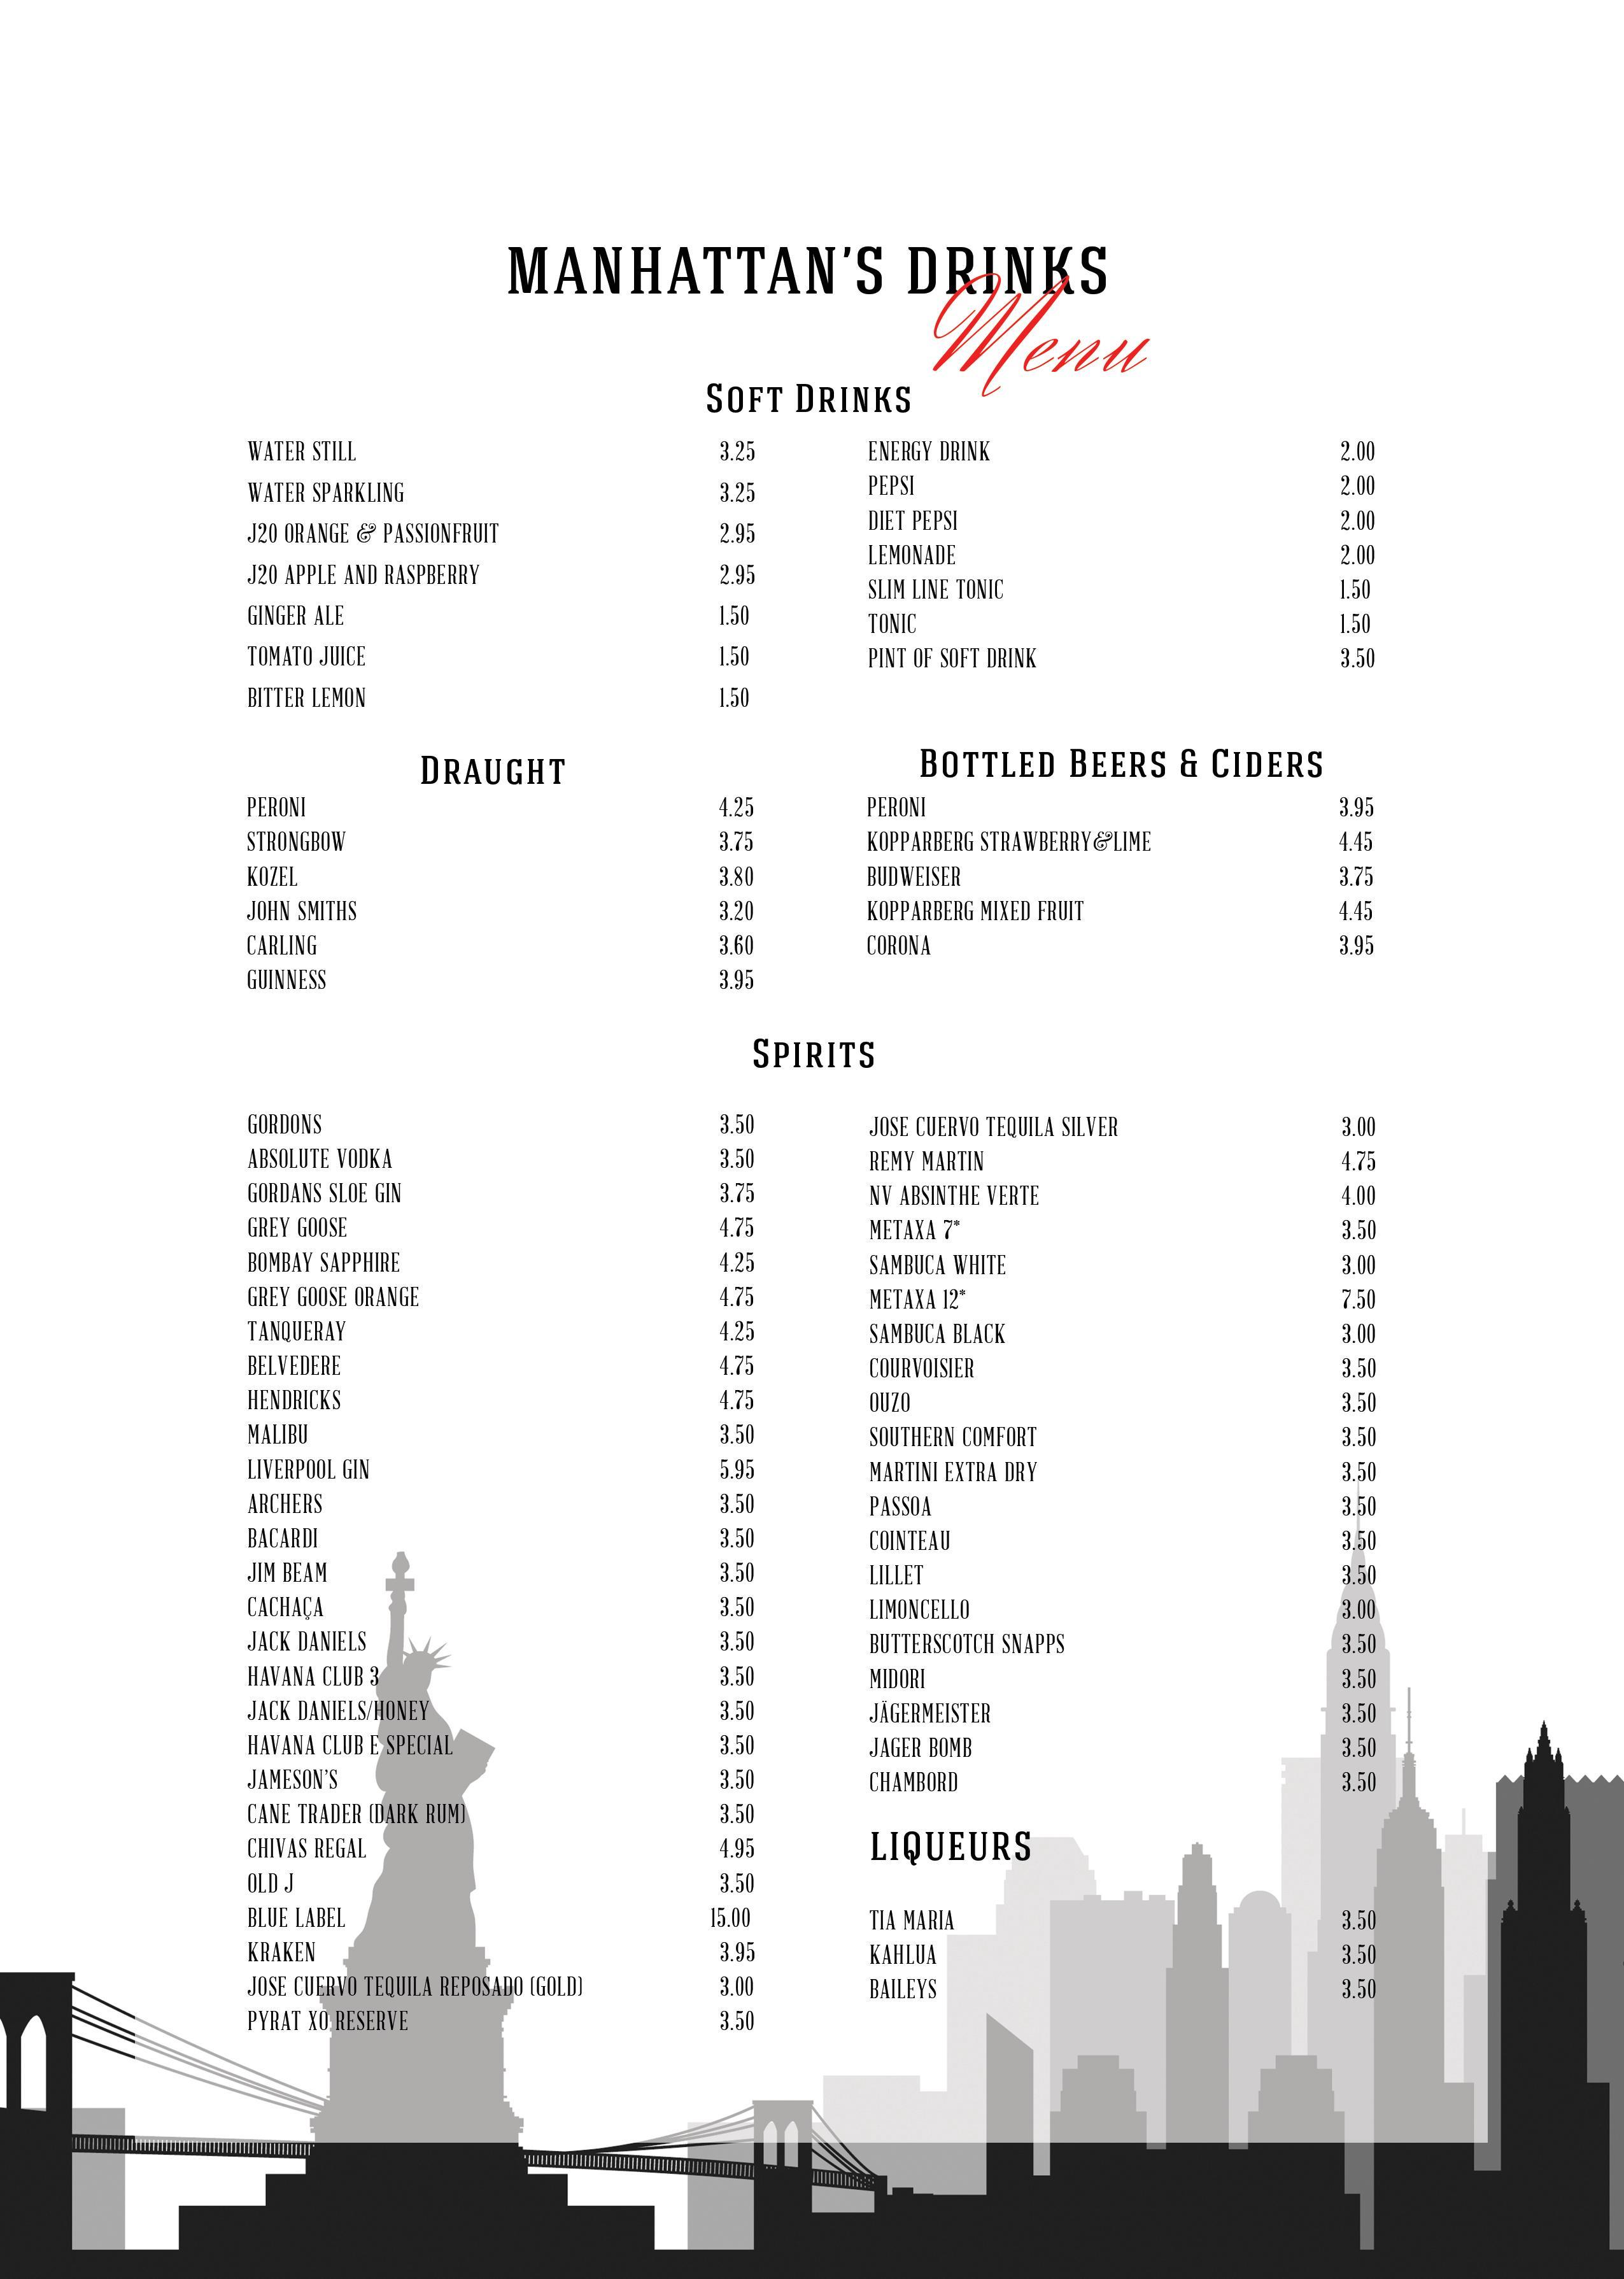 Manhattan Bar and Grill Drinks List